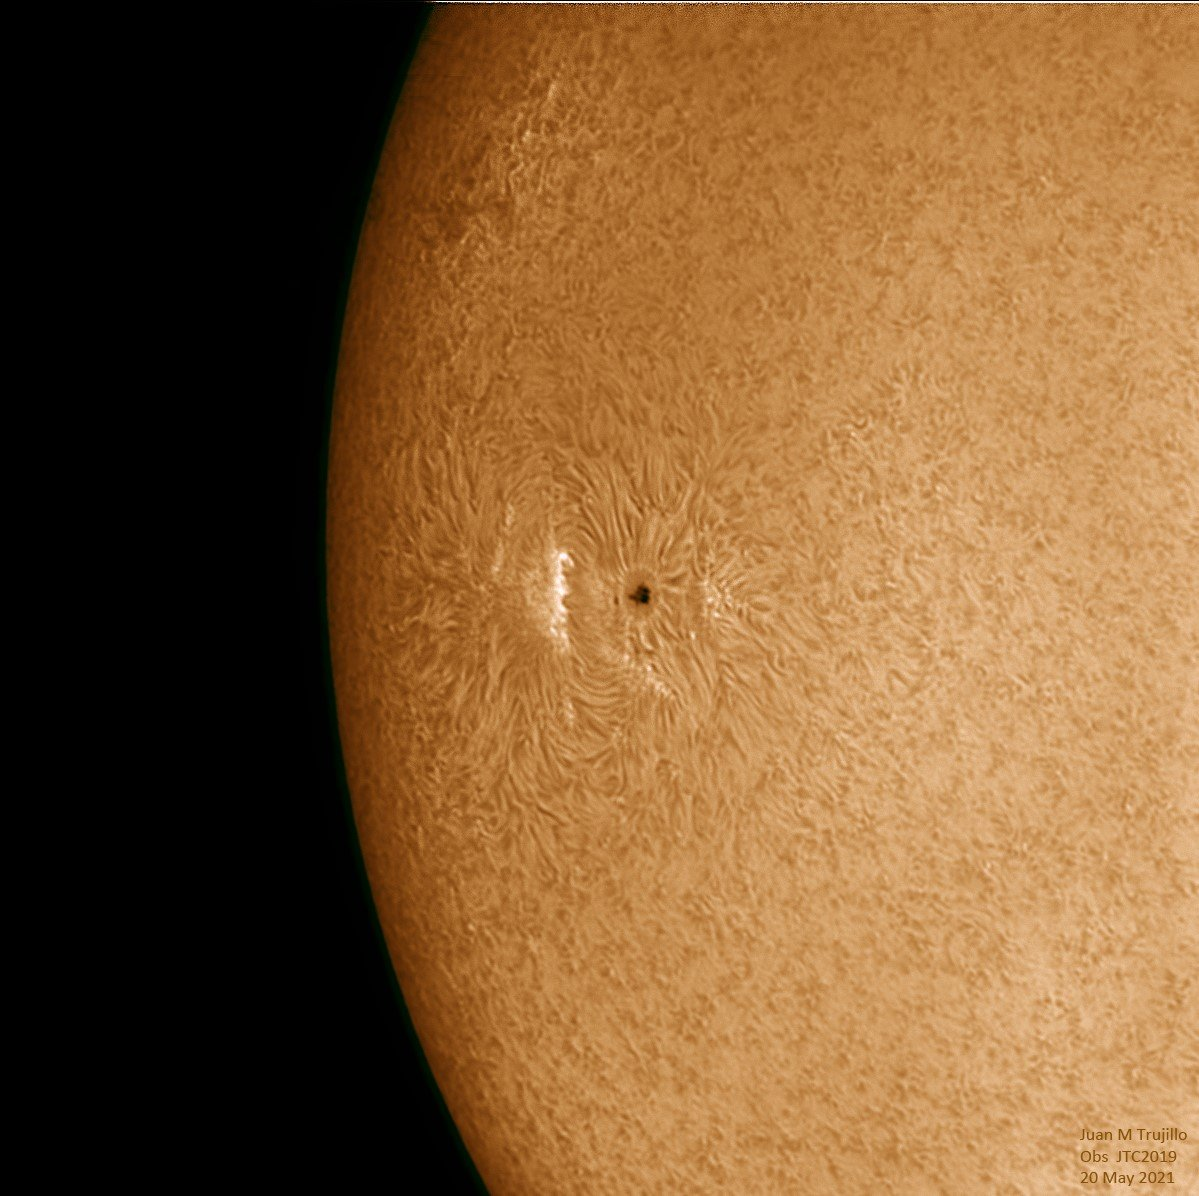 Detall Cromosfera Sol - Juan Trujillo